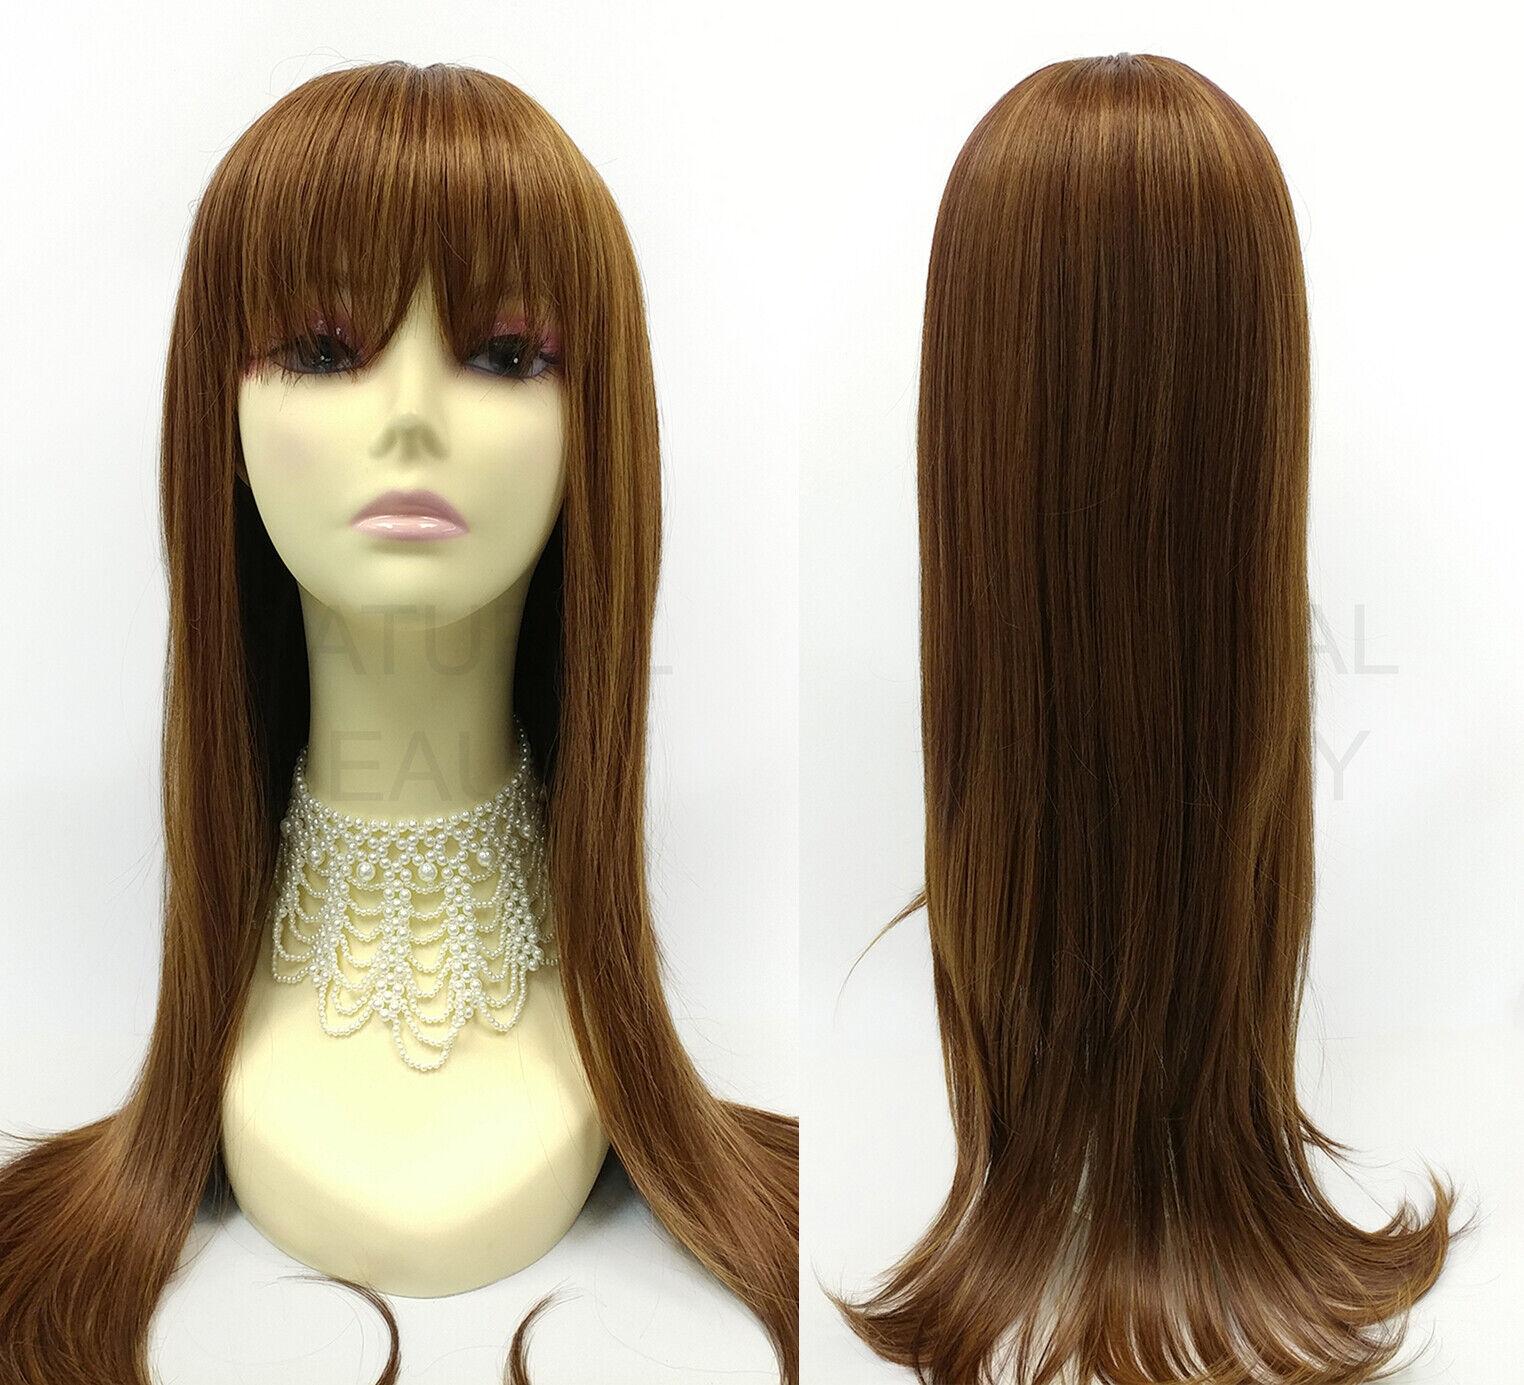 Heat Resistant Long Straight Wig Full Bangs Strawberry Blonde Auburn 26  - $49.99